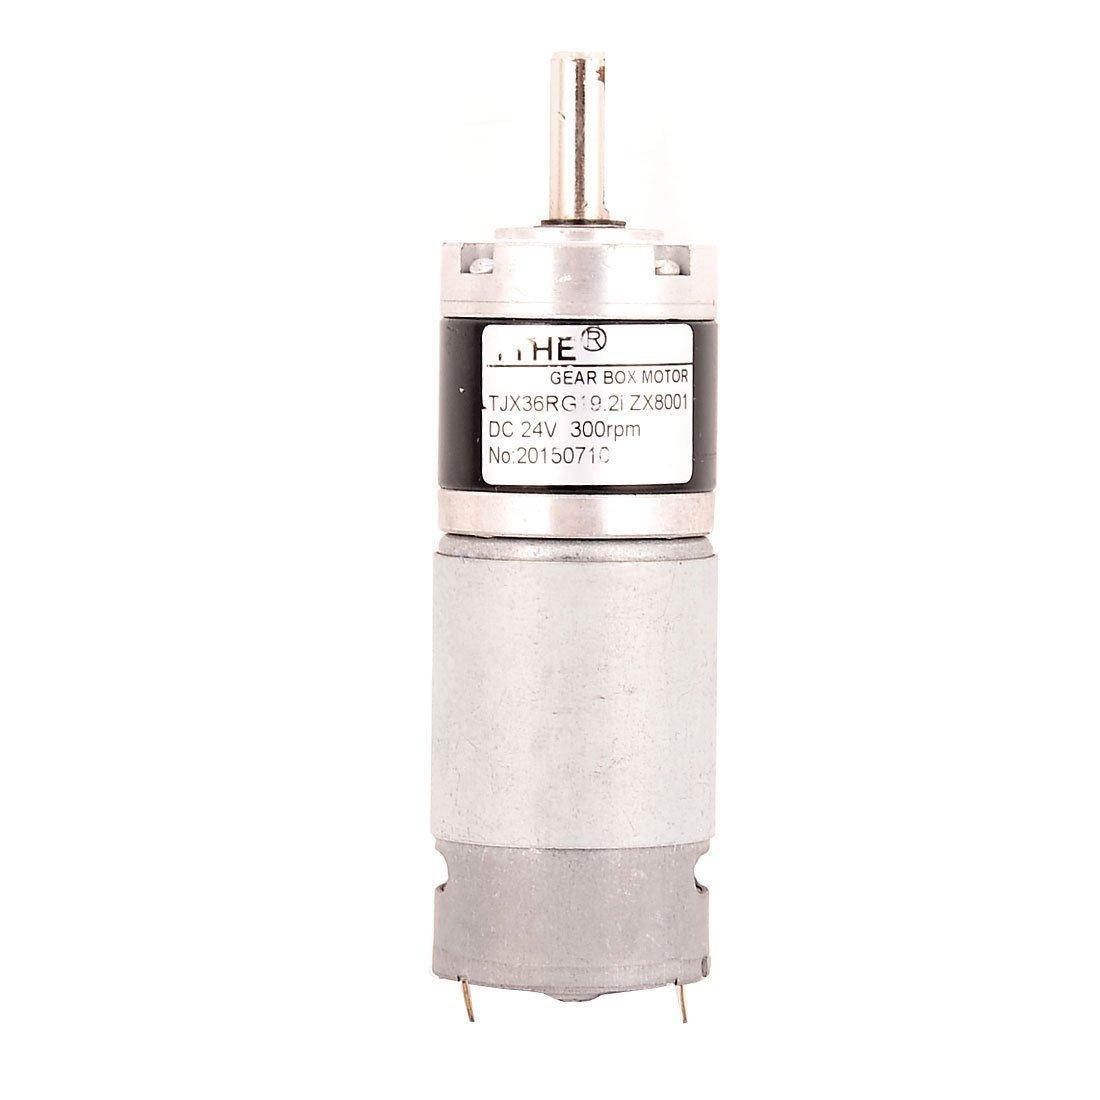 DealMux a16010600ux0096 DC 24V 300 rpm High Torque 8 mm Eixo Di Amp, baixa velocidade de solda Gear Box Motor